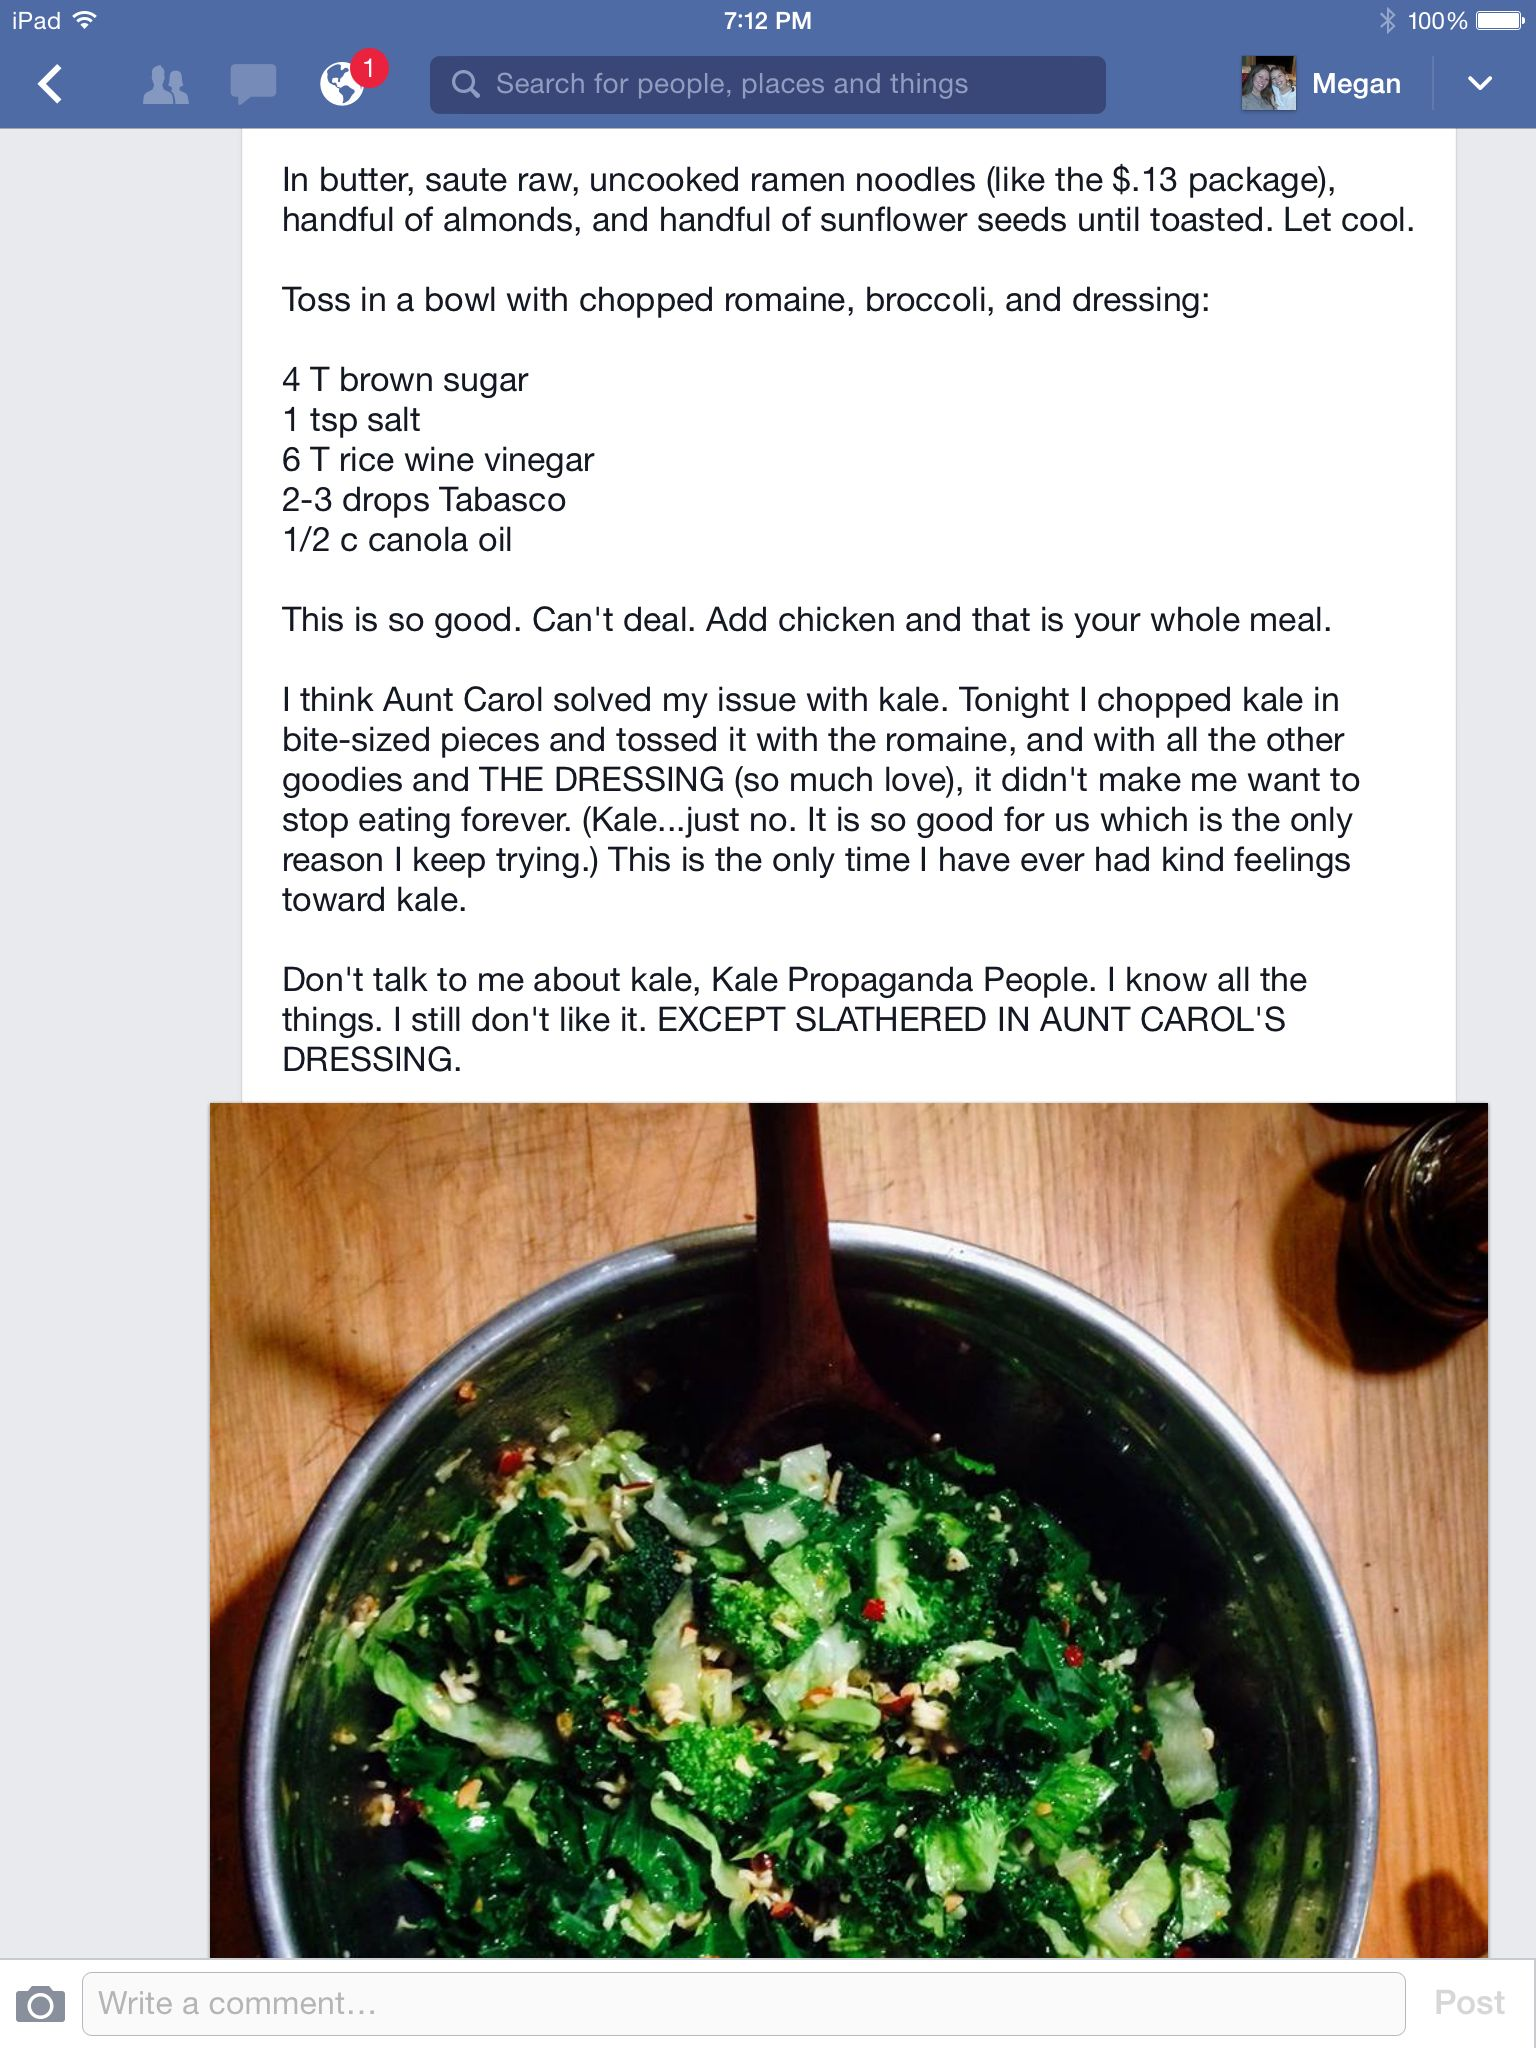 Aunt Carol S Crunchy Salad Jen Hatmaker No Link Just